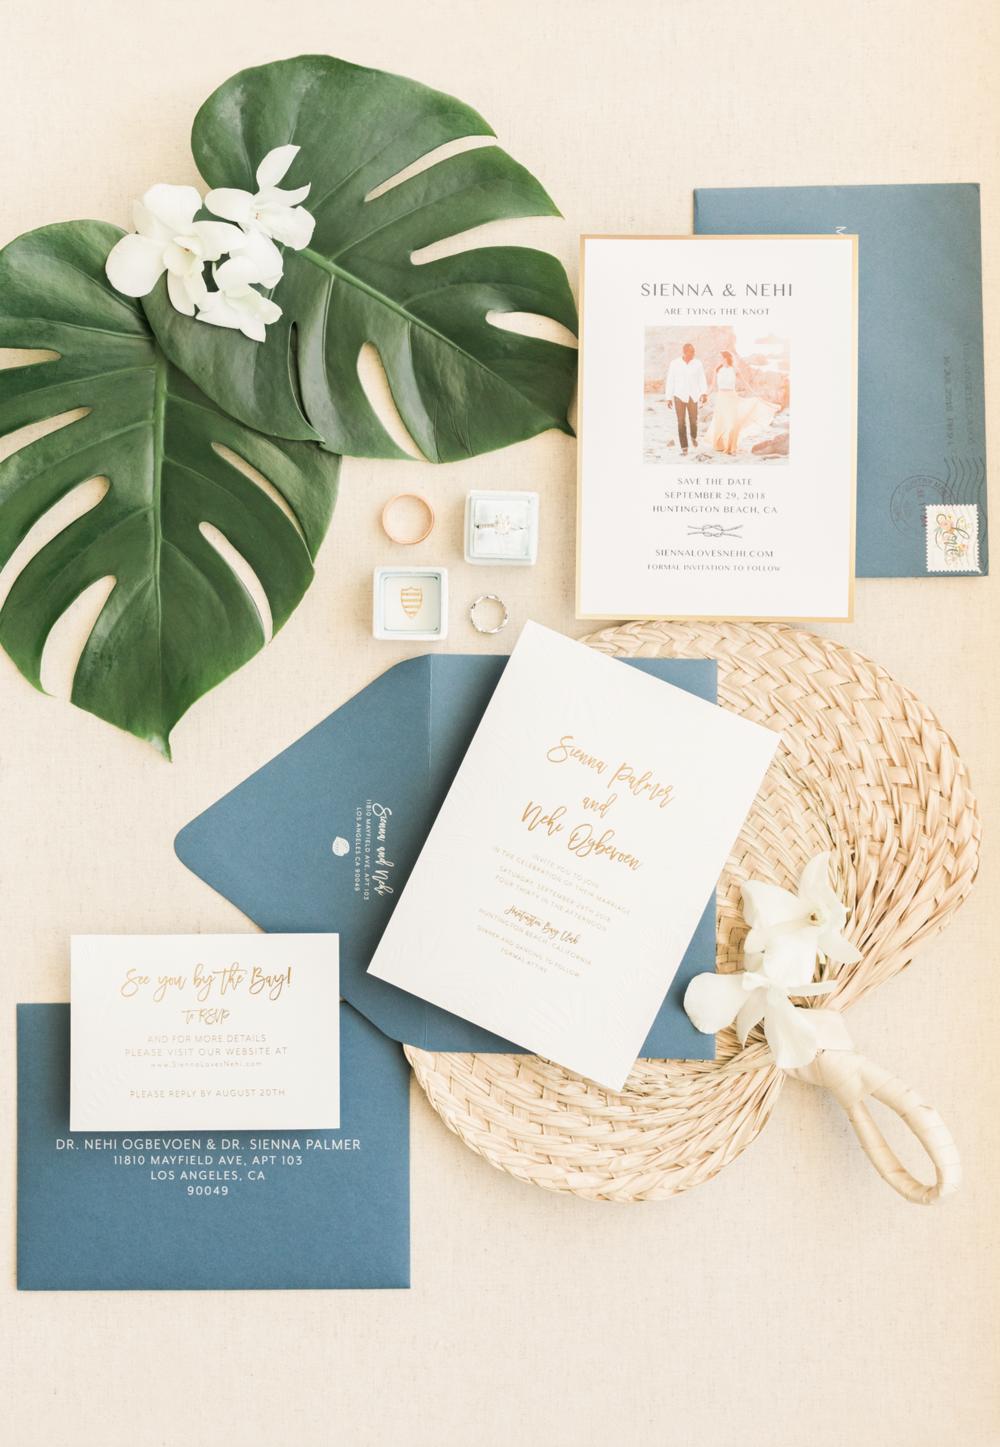 Swell Press Sienna Nehi Letterpress Wedding 1.23.33 PM.png